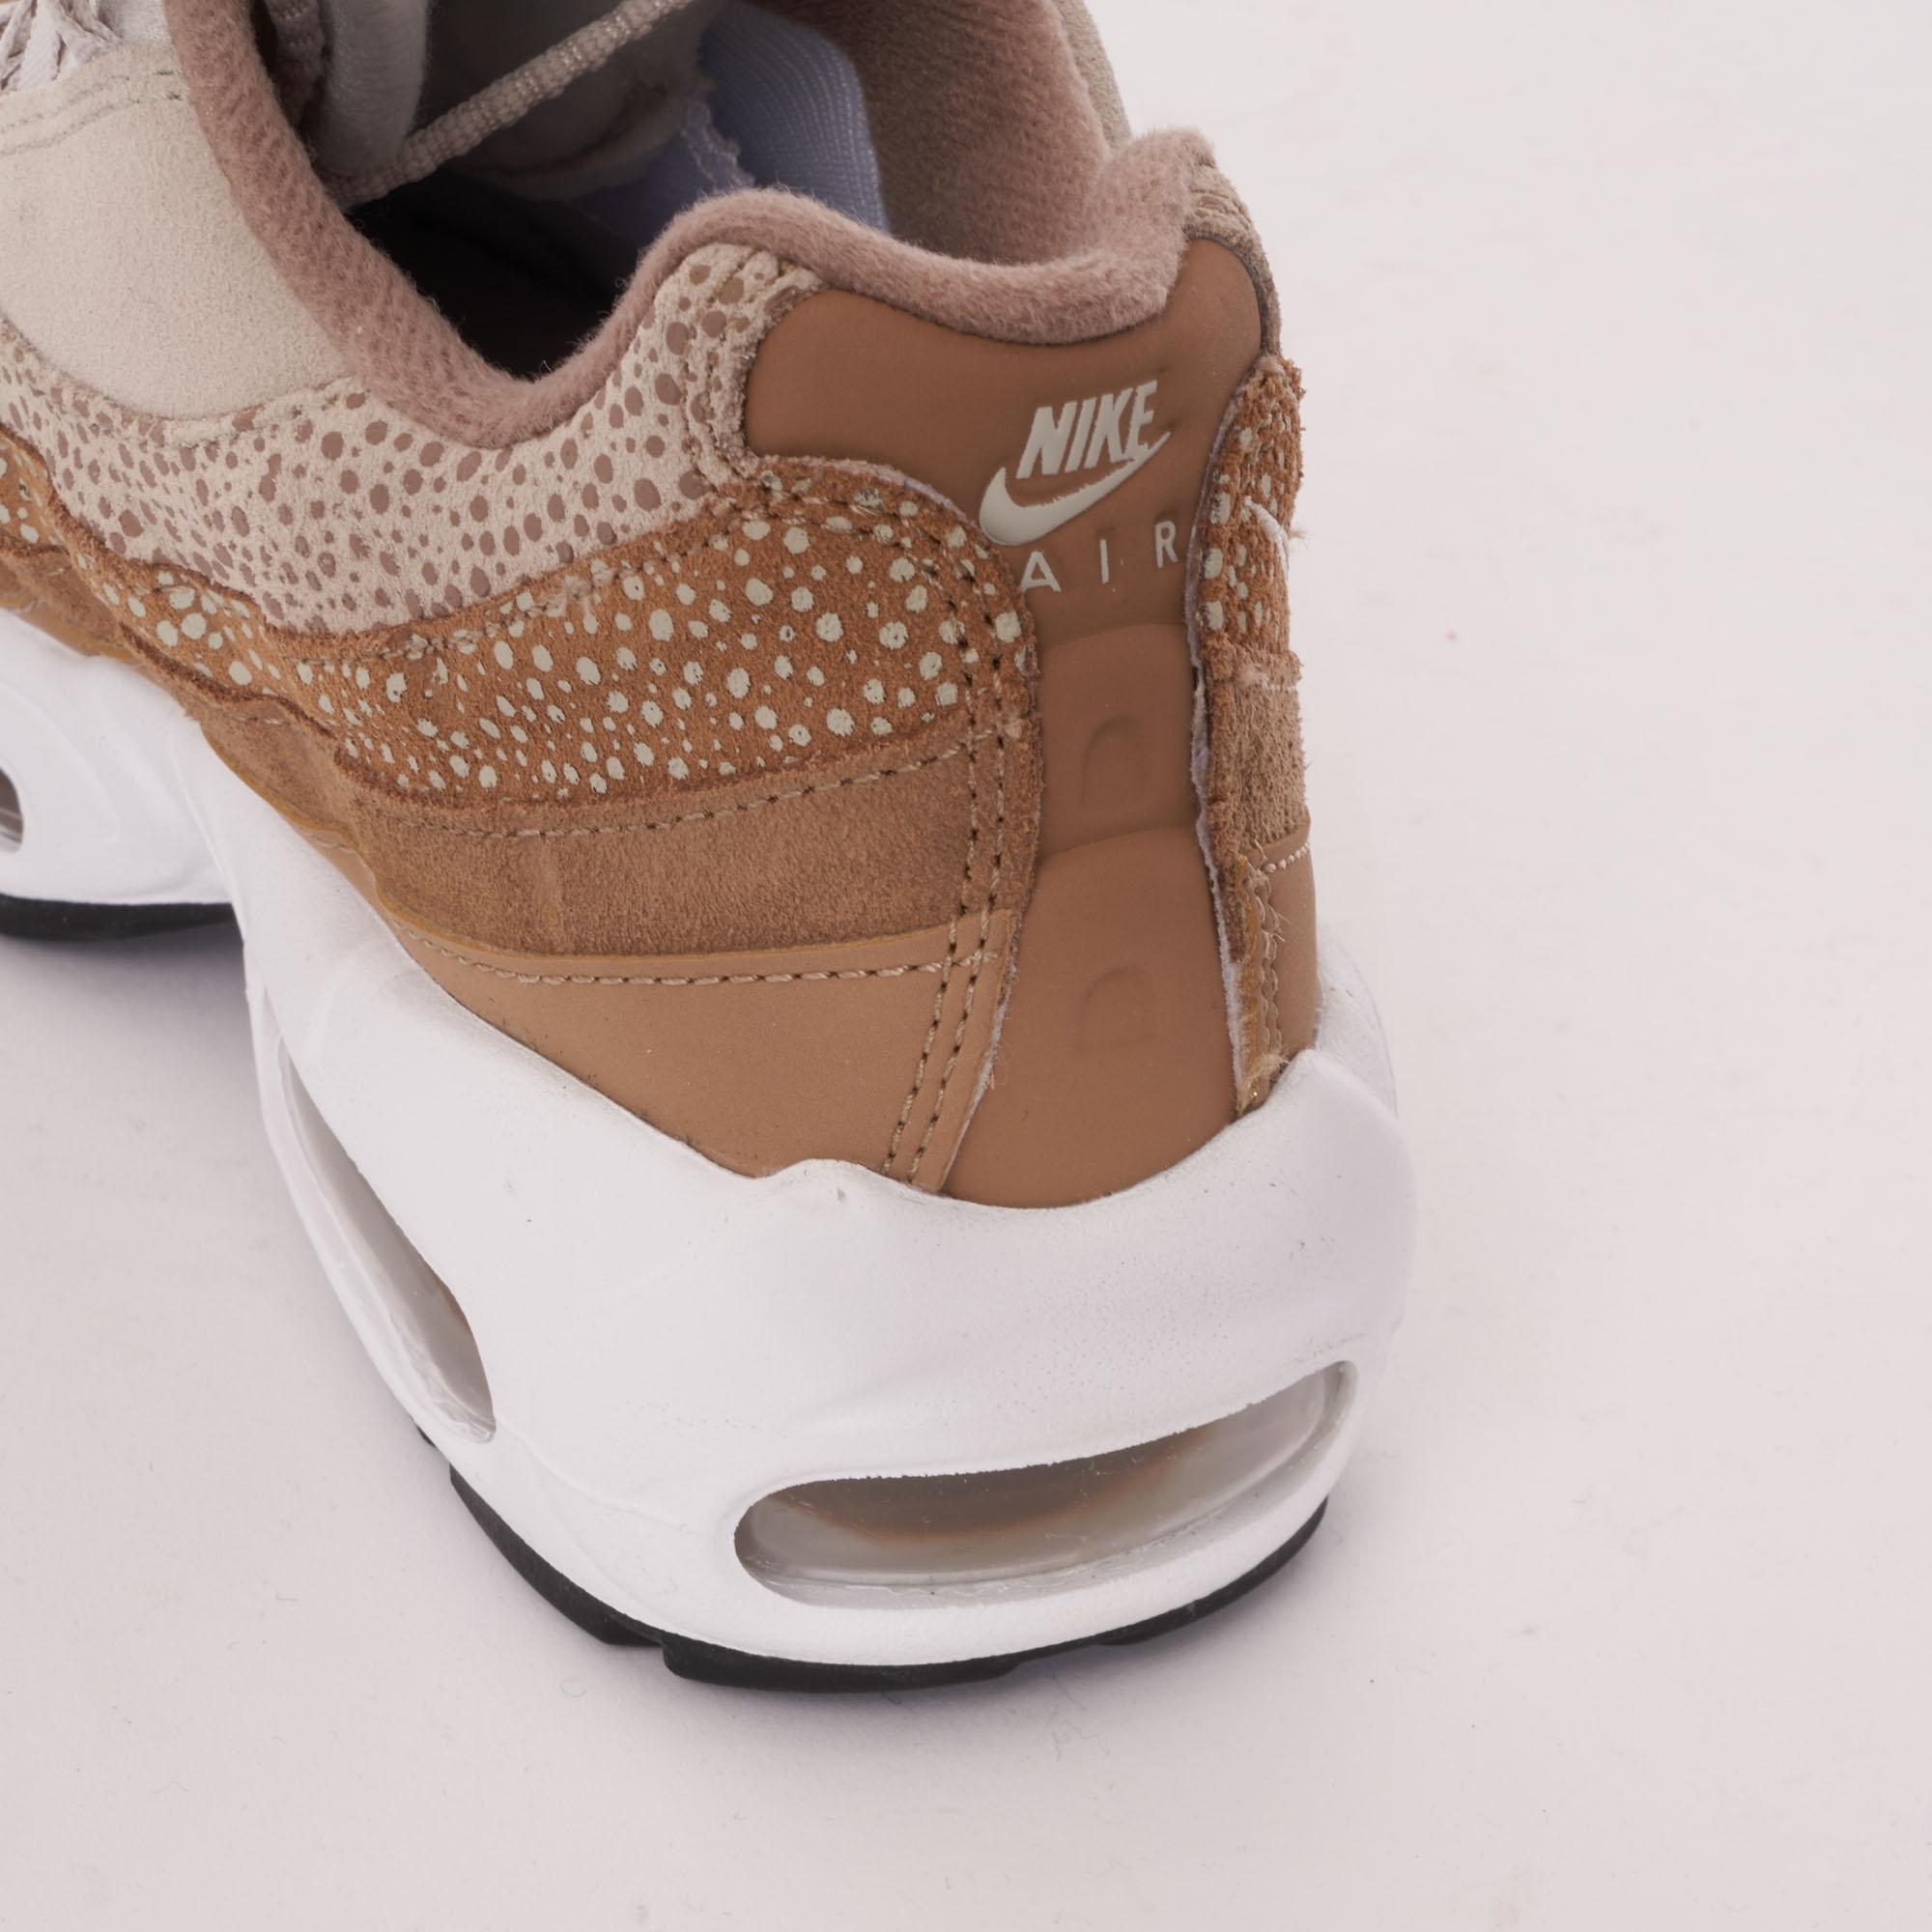 47f00c1f844 Nike Womens Air Max 95 Premium